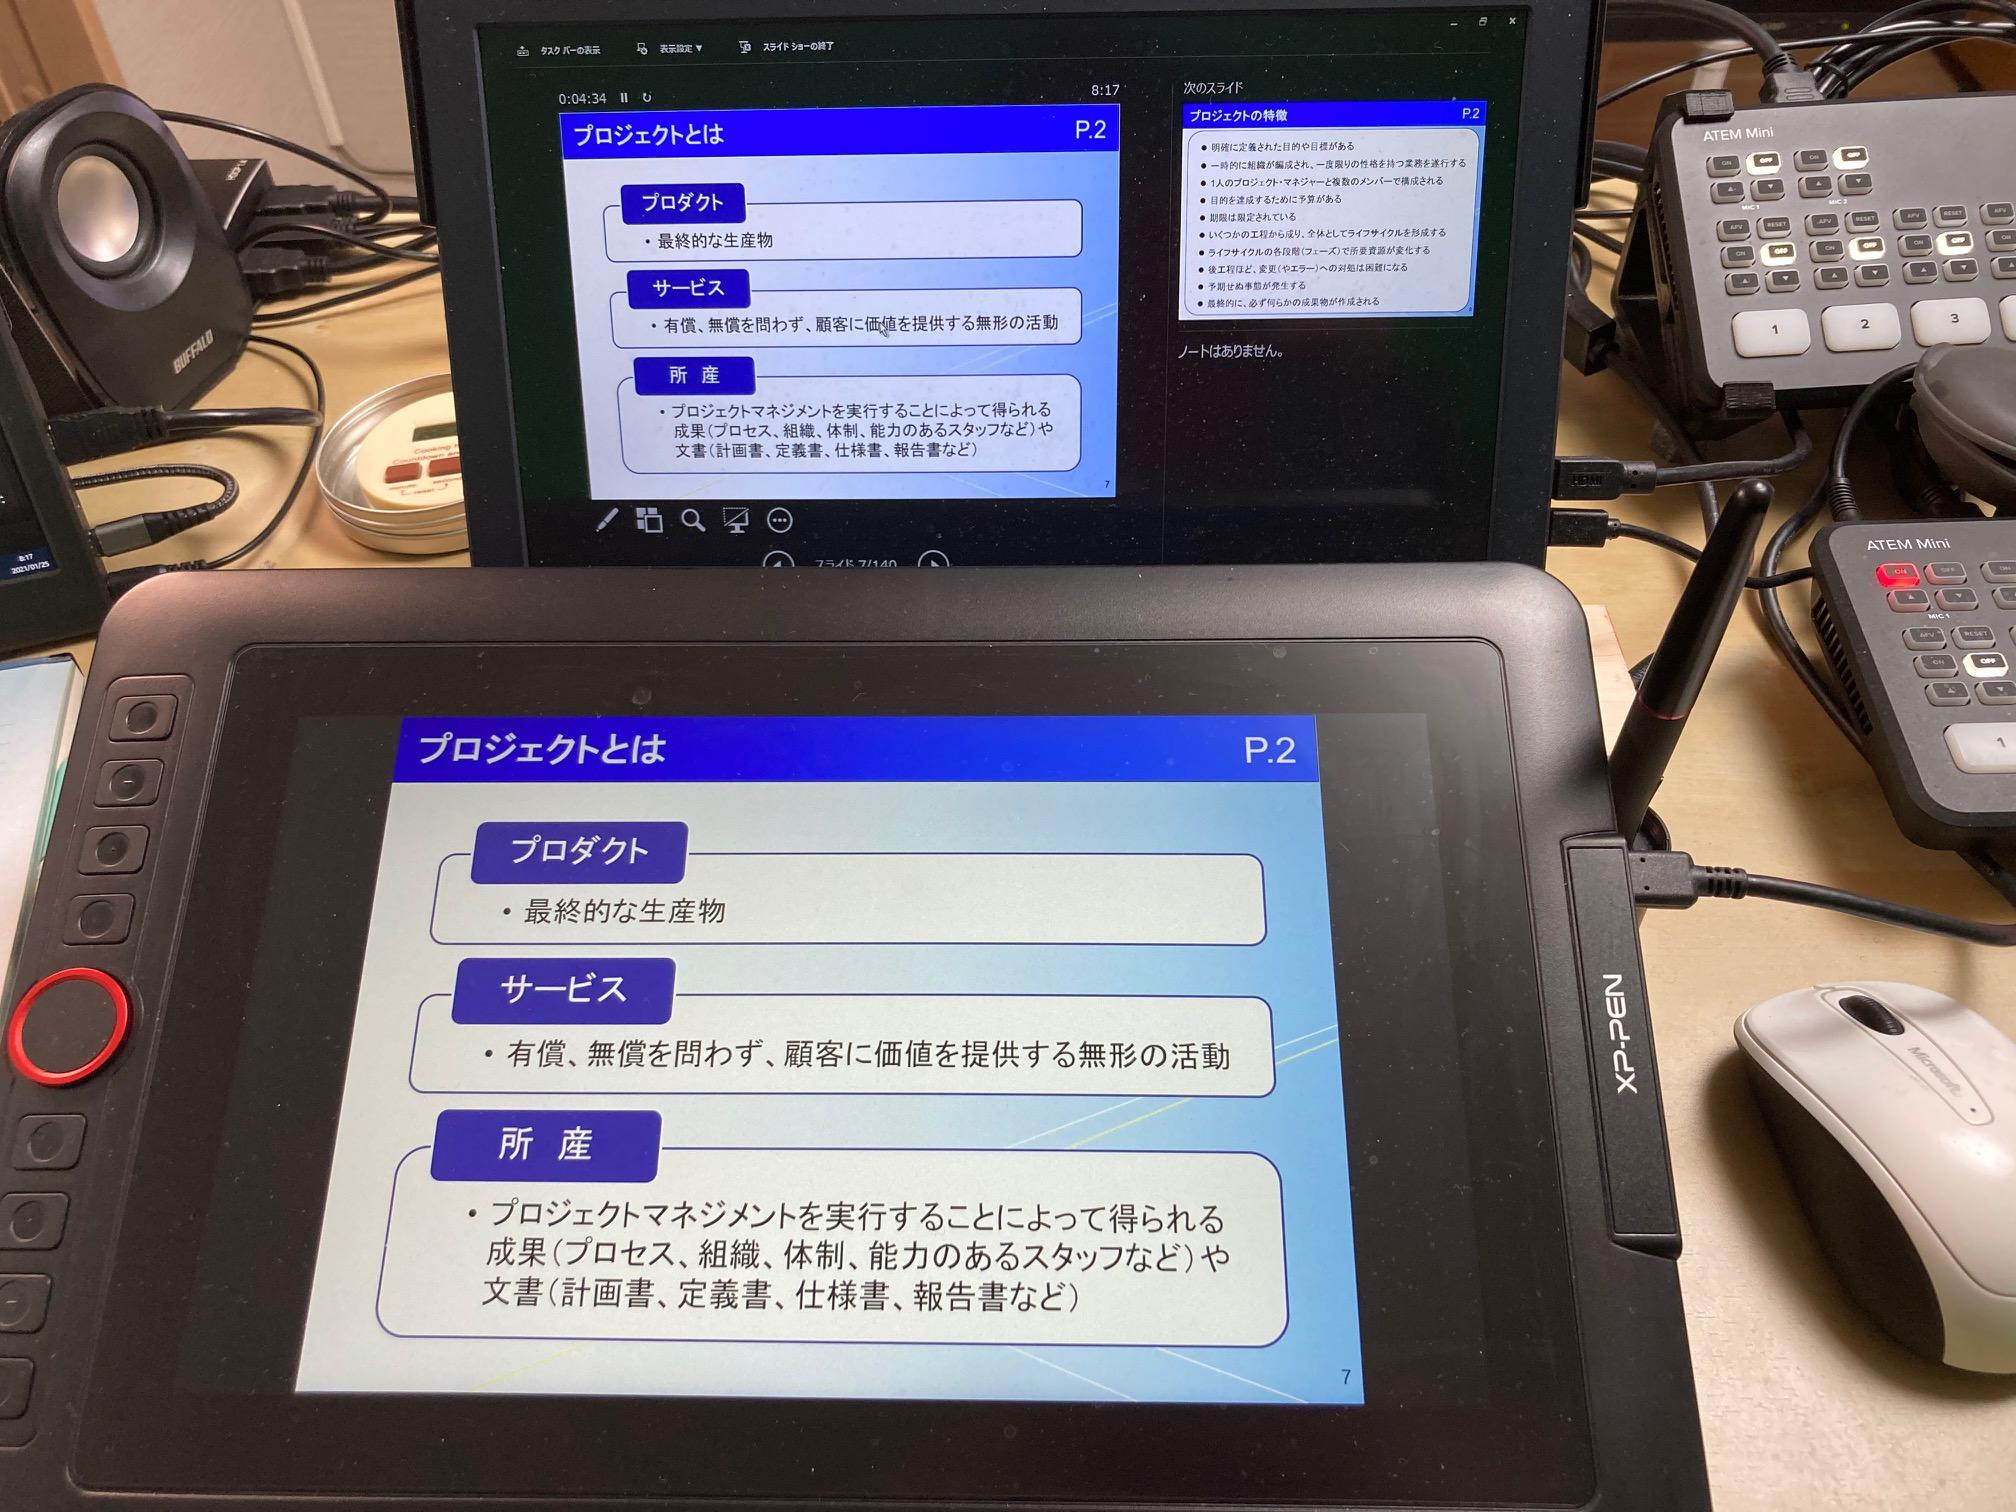 https://blogs.itmedia.co.jp/tani/925572c7d2bb5b54a07a589929f81f432c9ebc0c.jpg